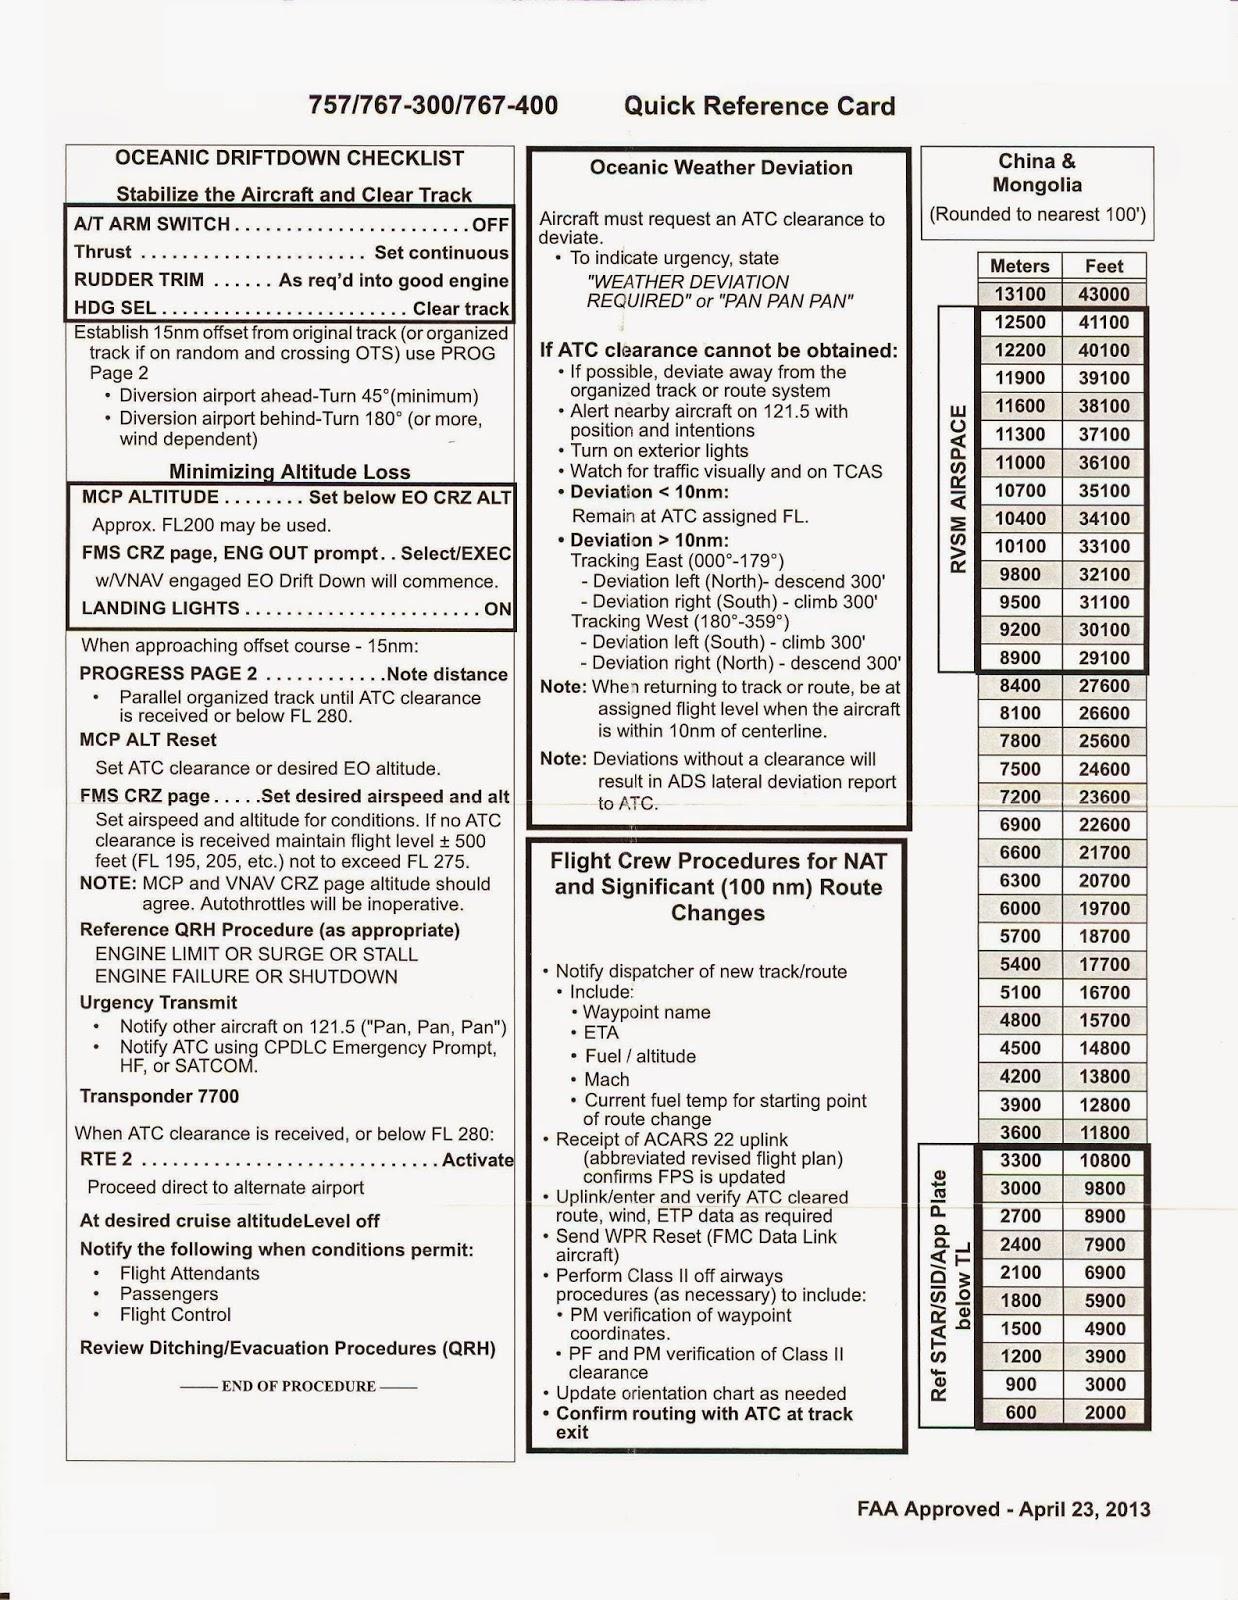 737 300 Flight Manual